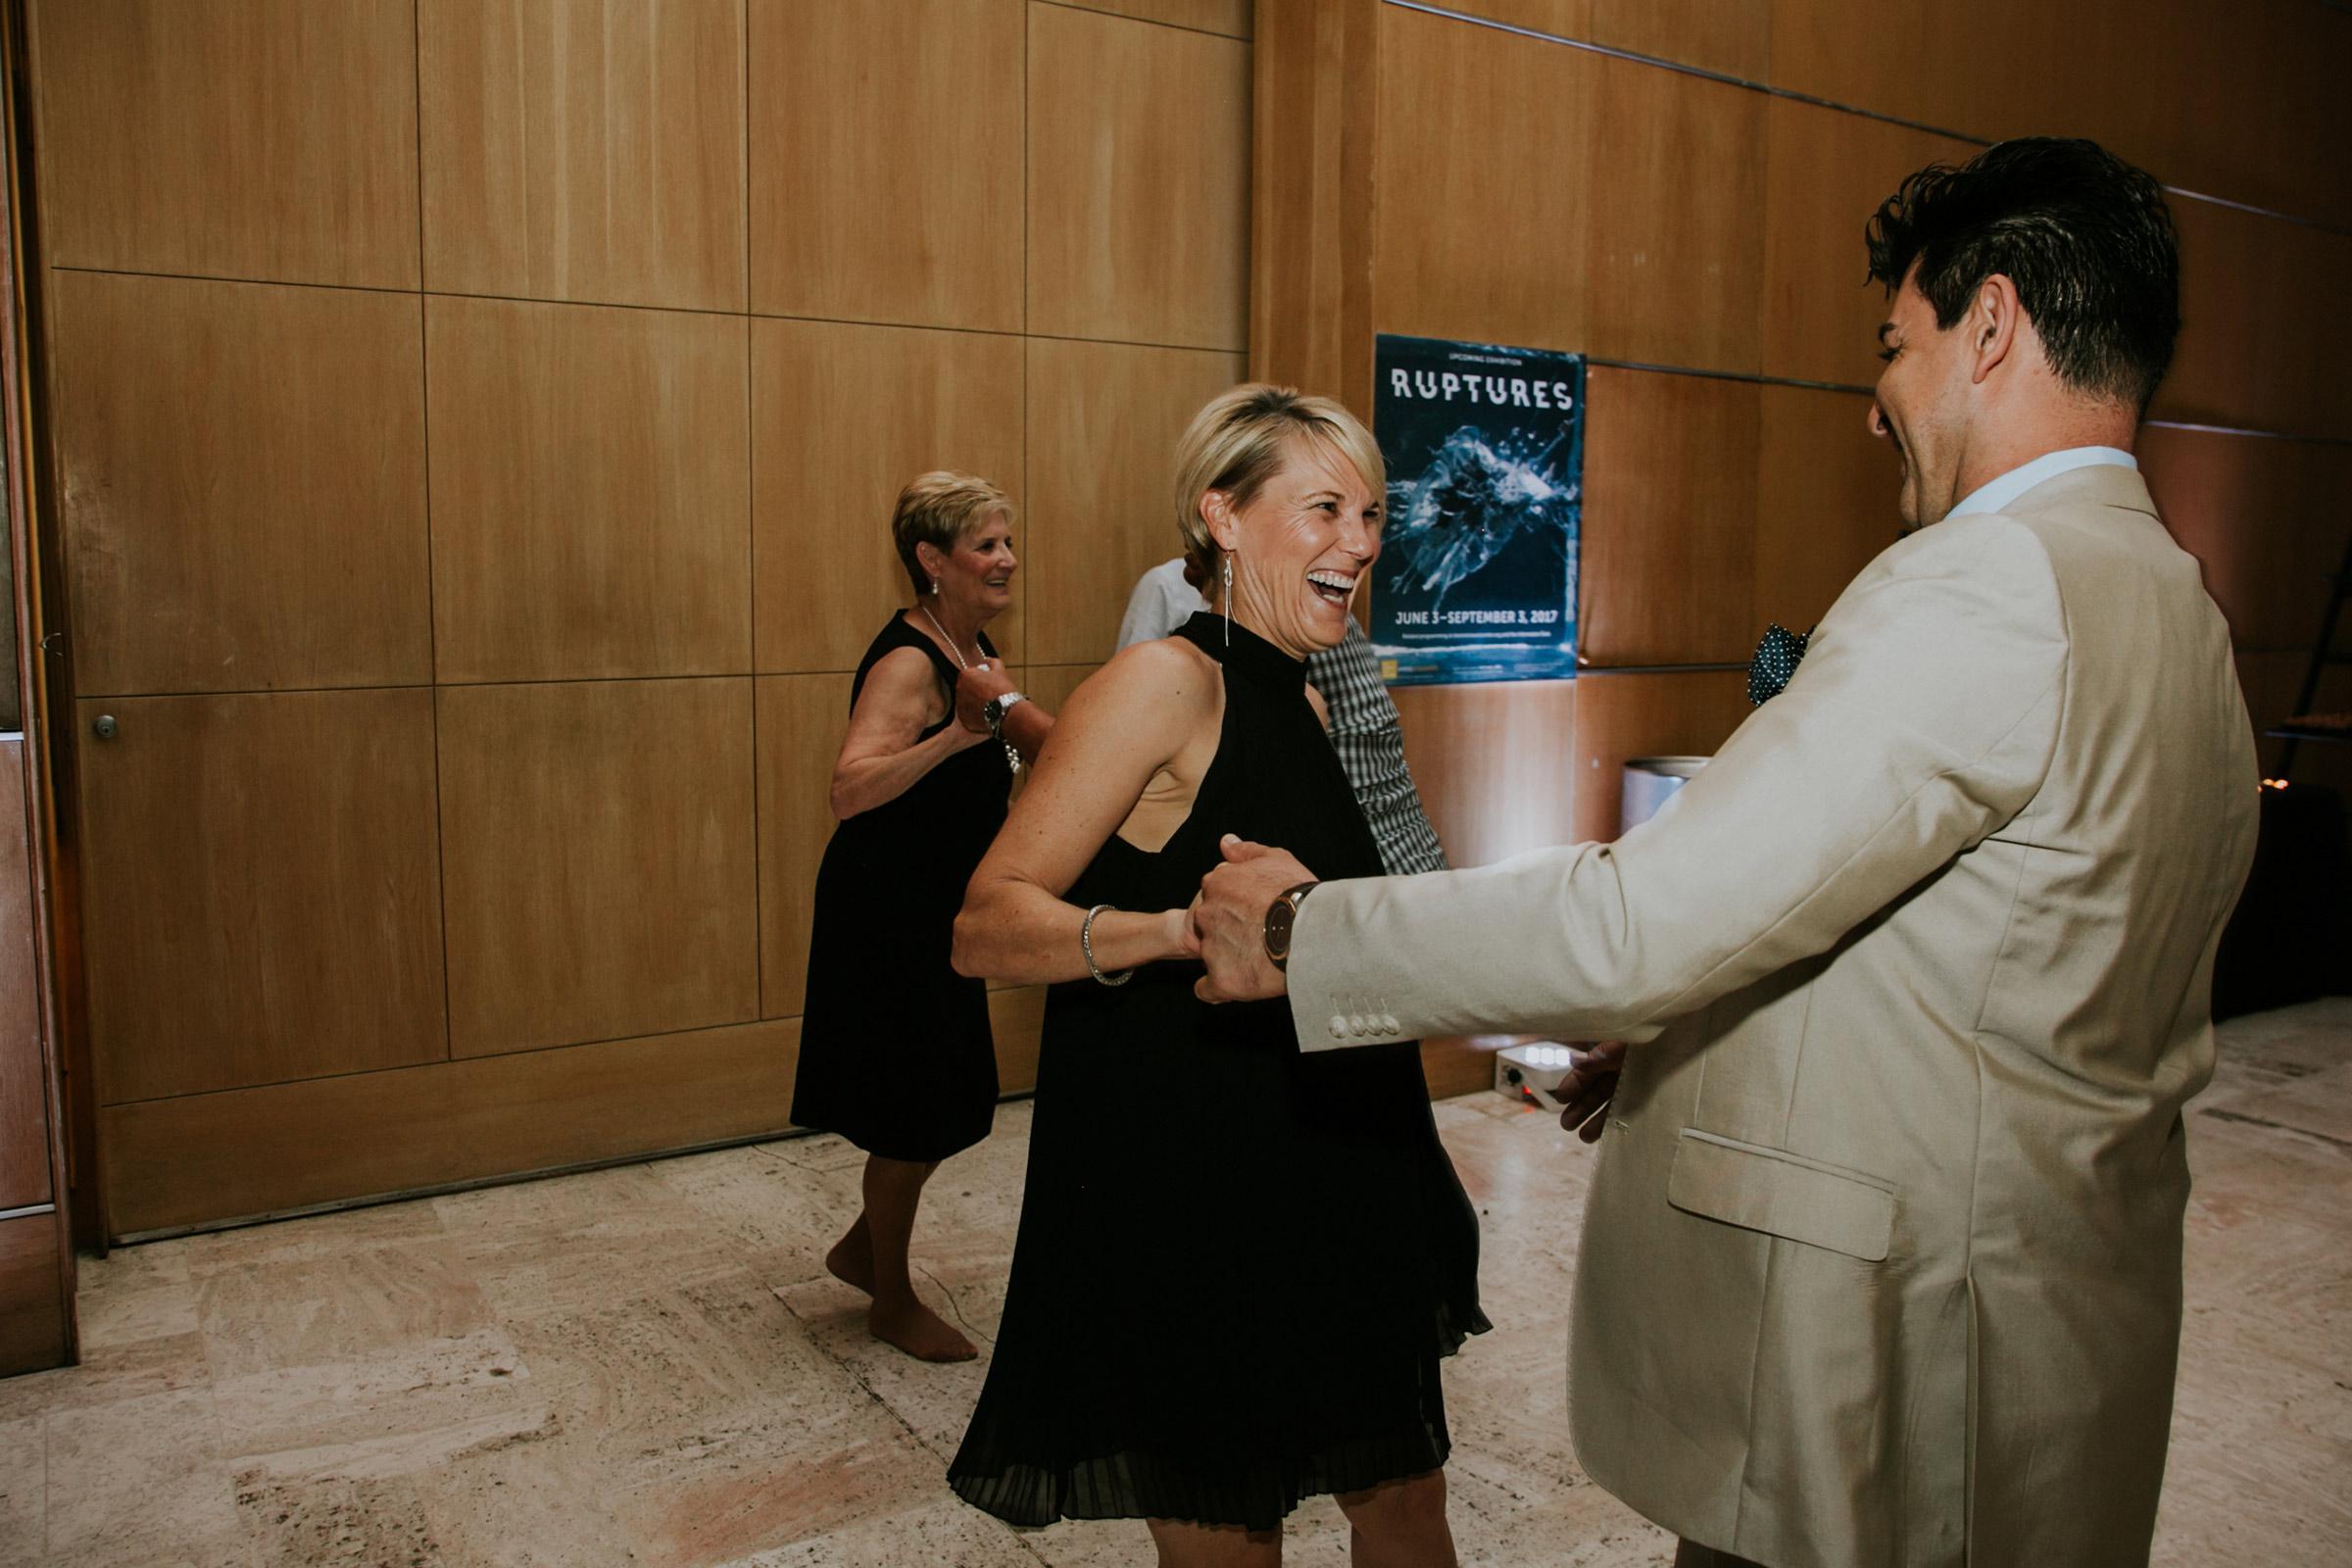 guest-laughing-dancing-on-floor-having-fun-desmoines-iowa-art-center-raelyn-ramey-photography.jpg